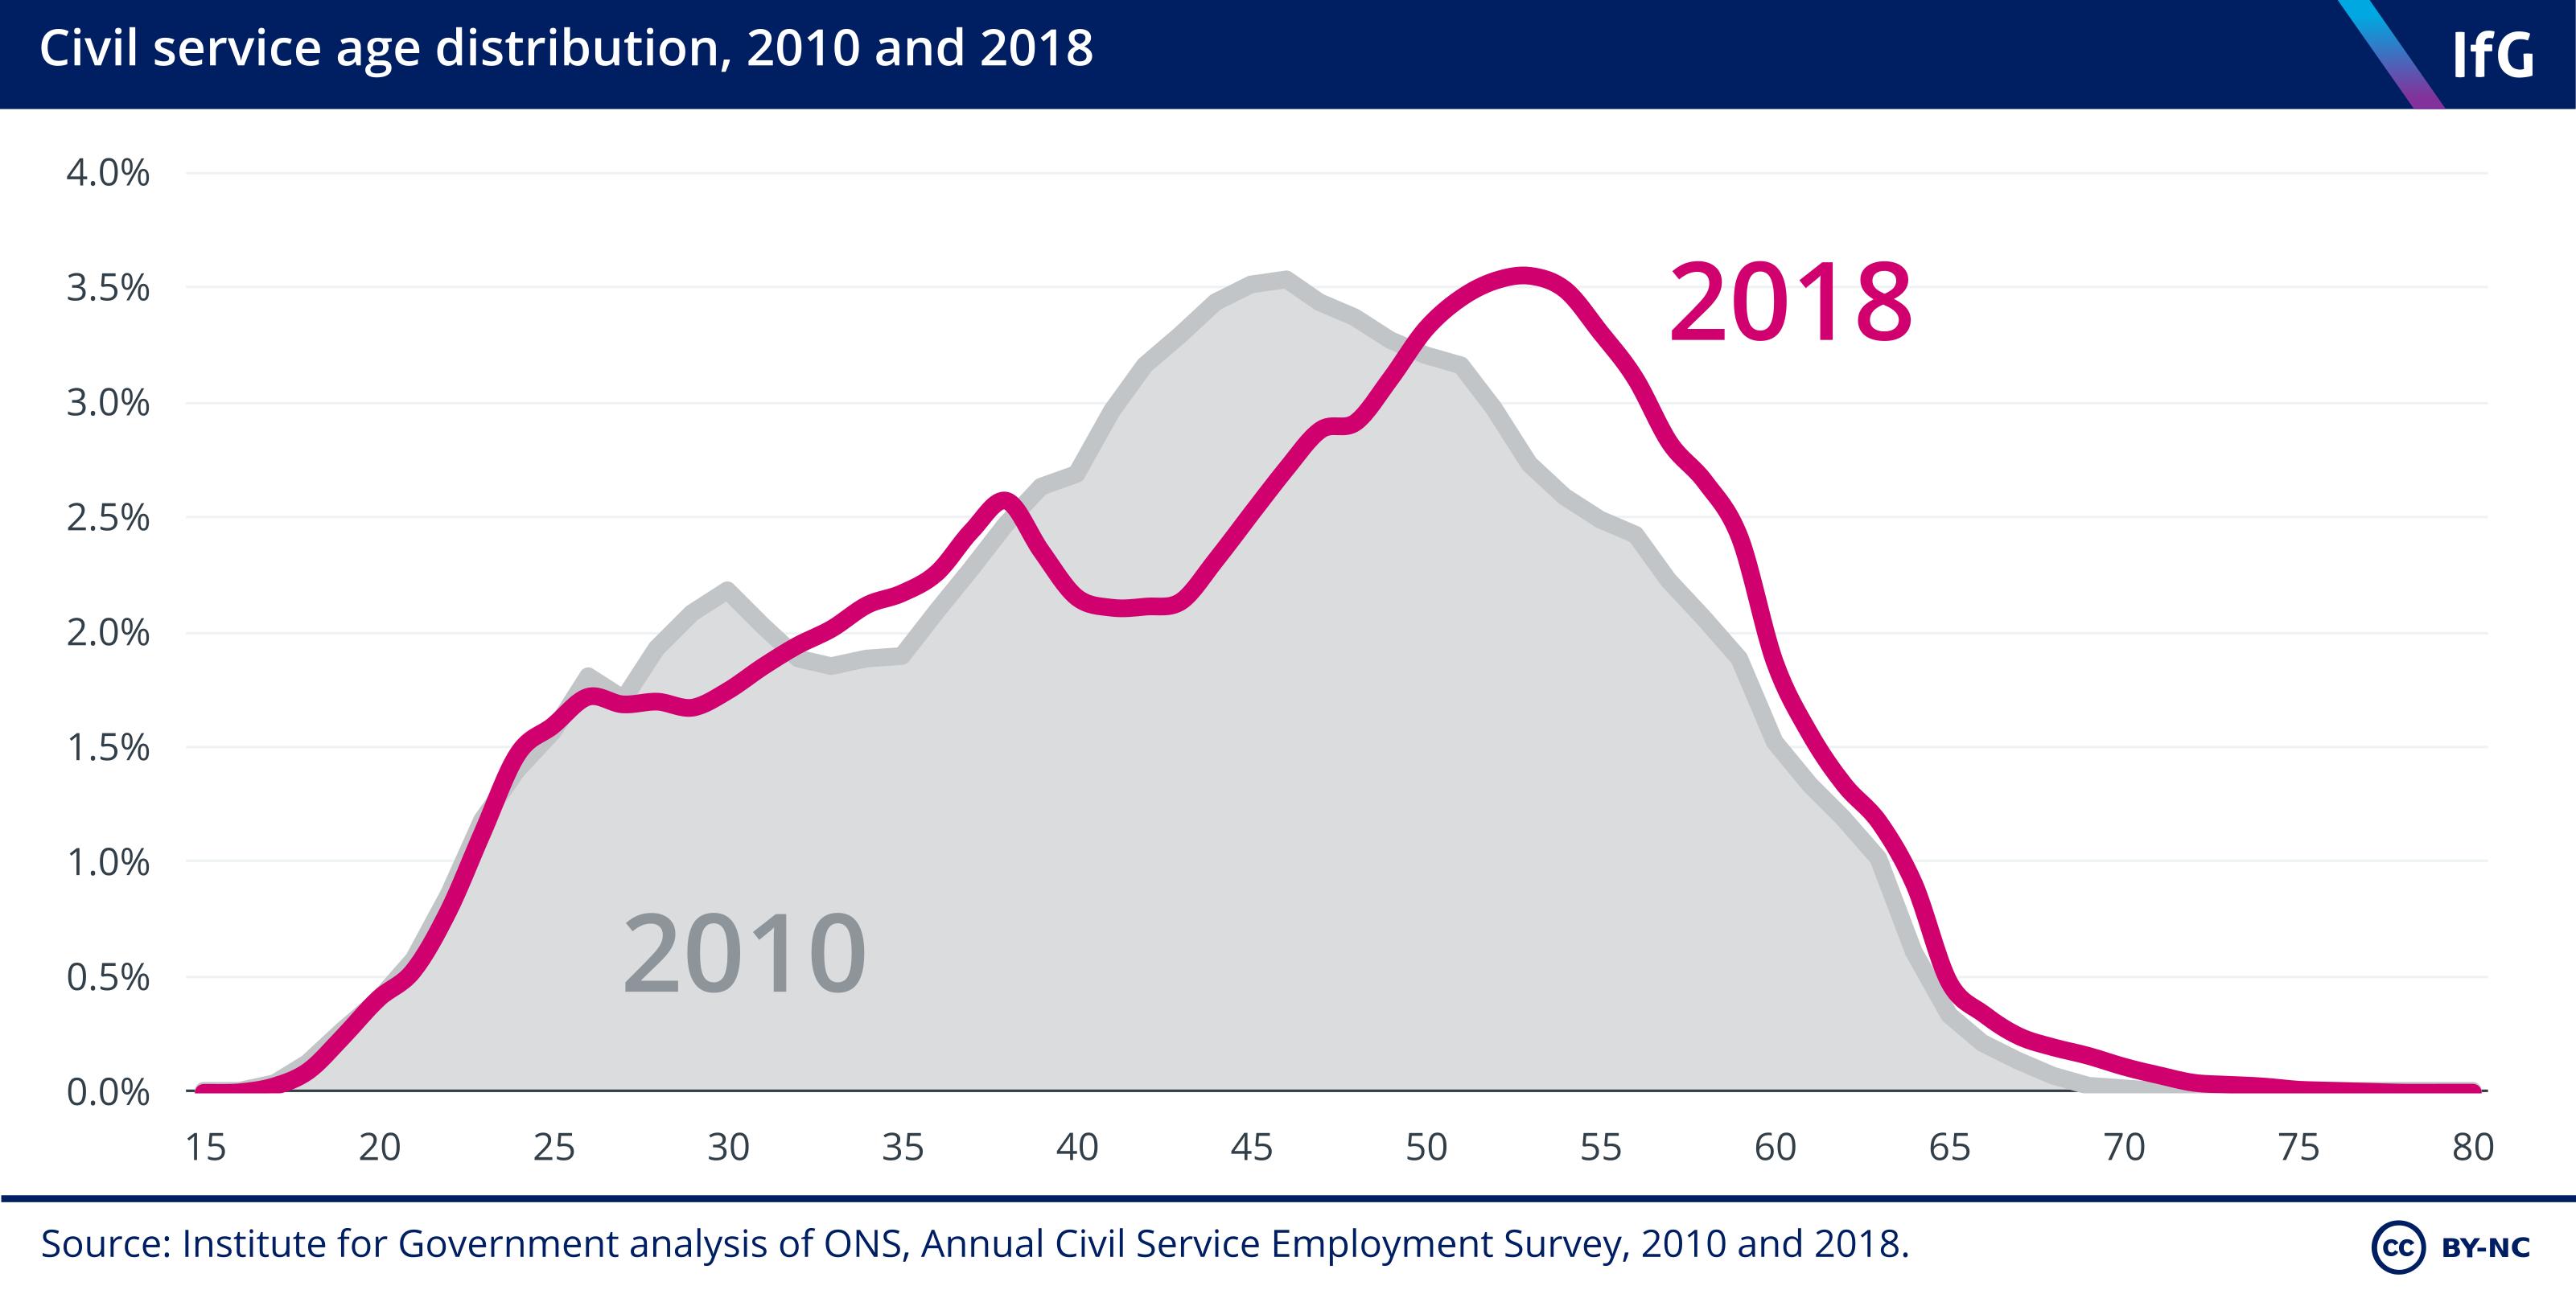 Civil service age distribution